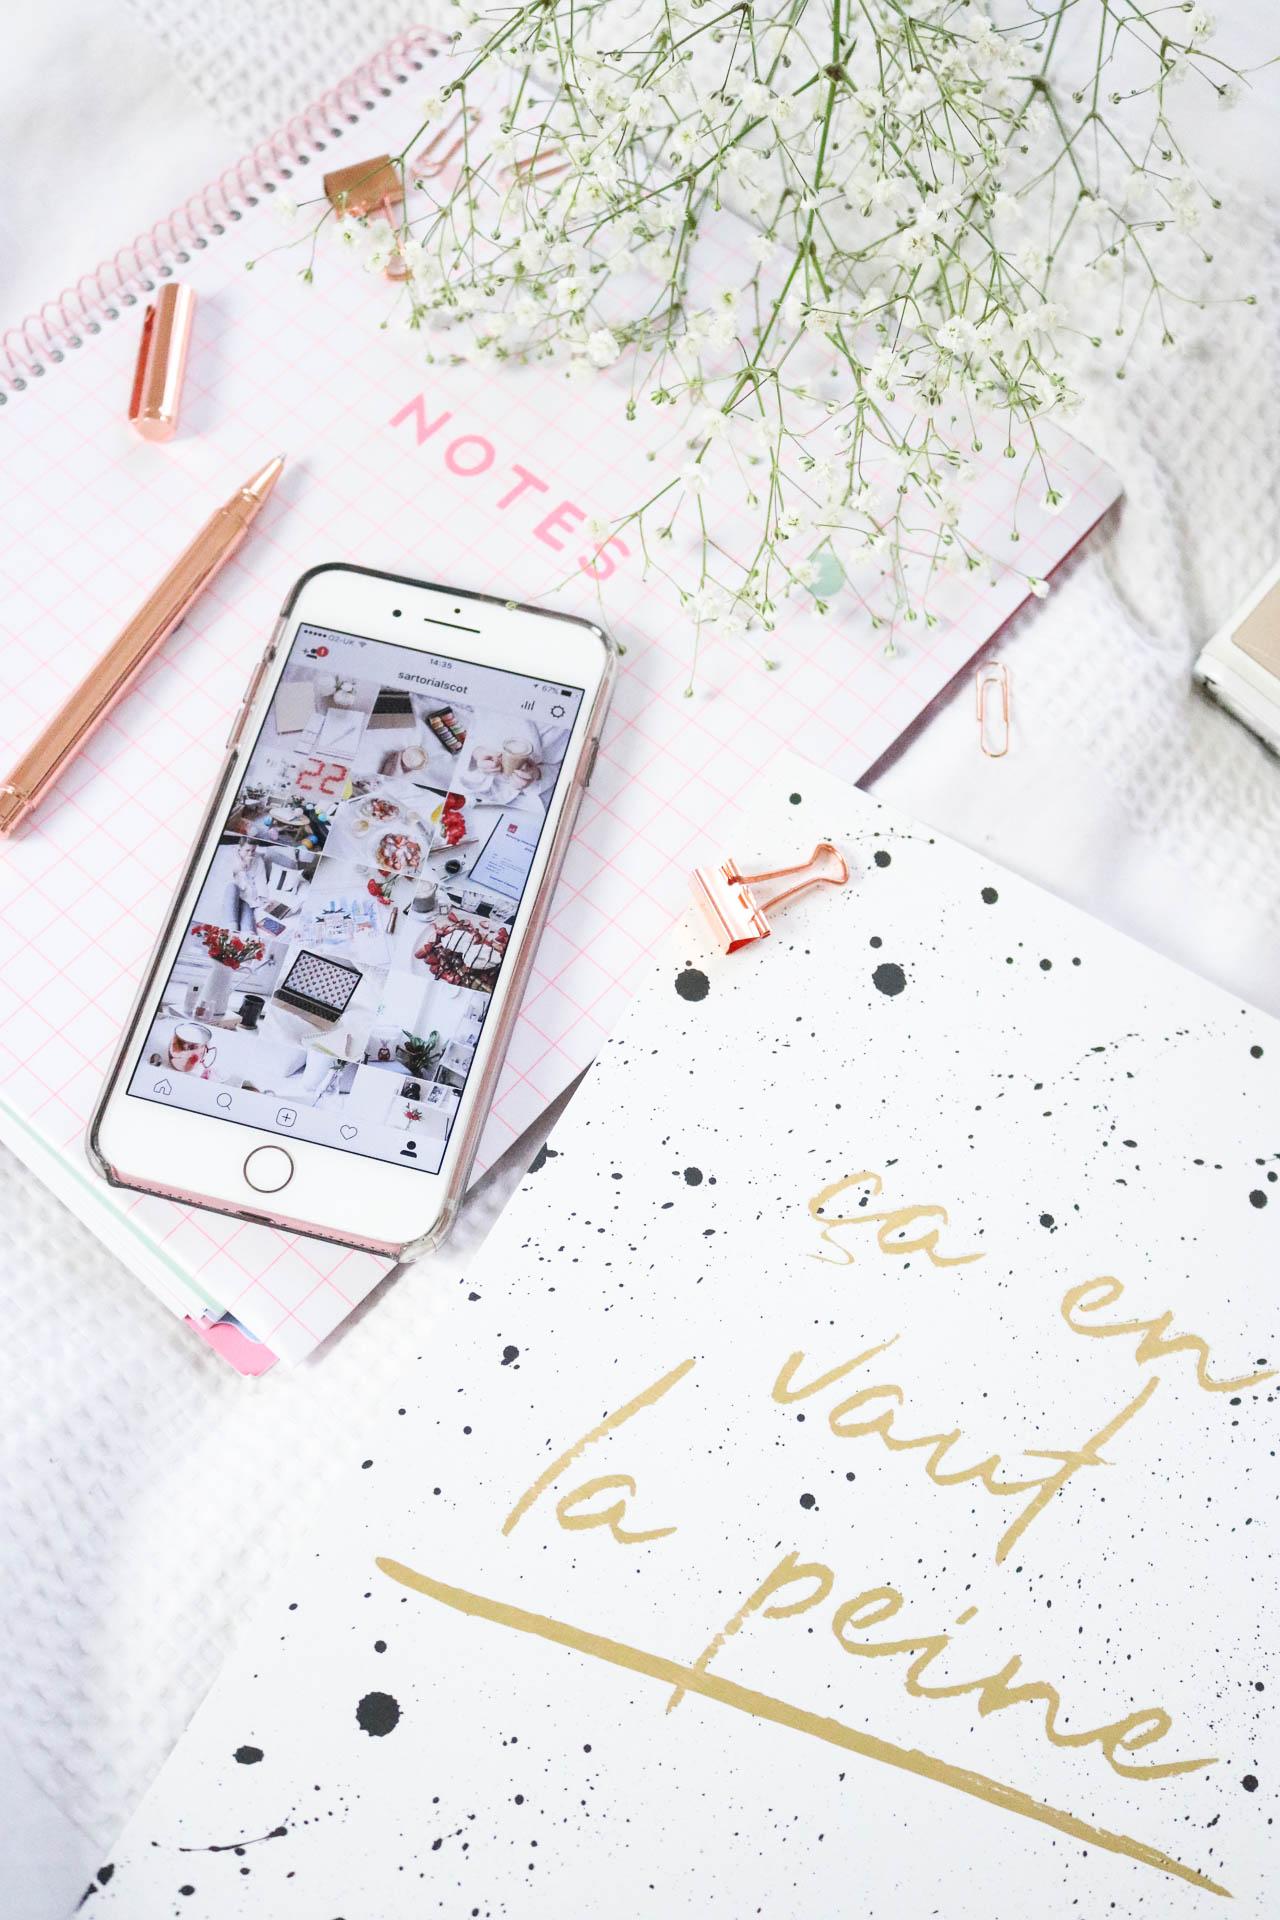 dissertation on instagram, fashion bloggers on instagram